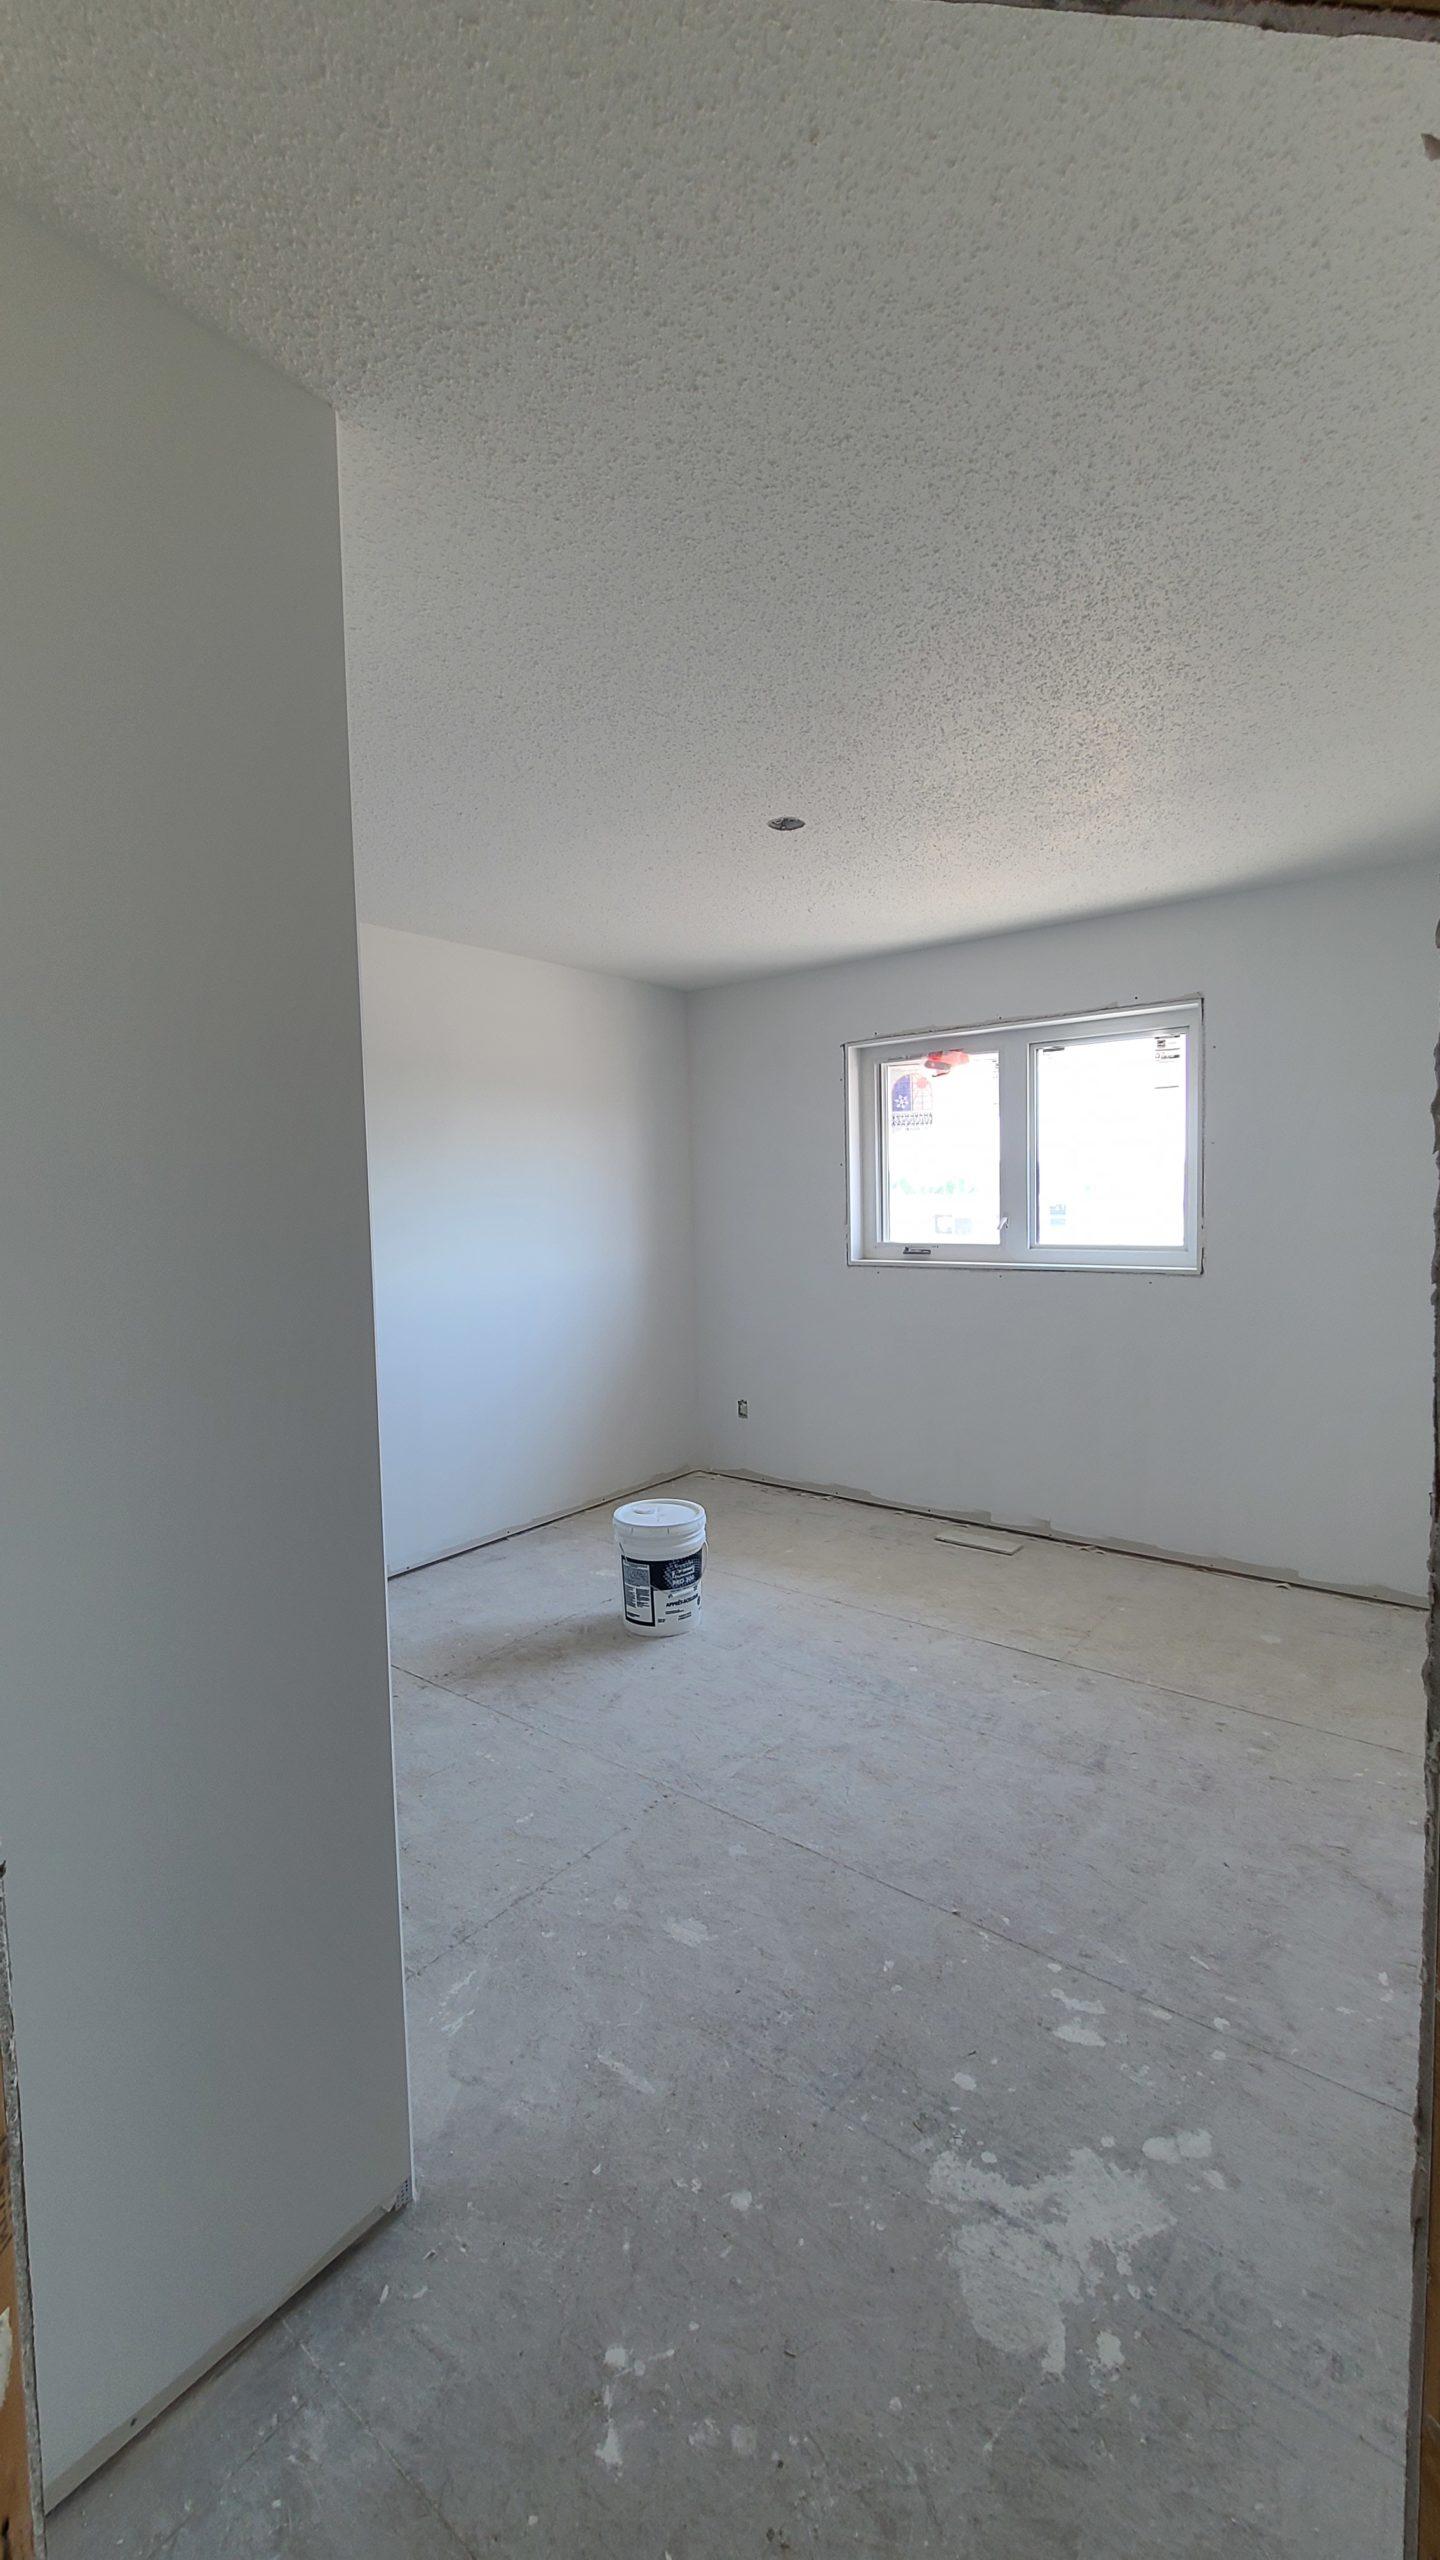 Spare Bedroom - 1 of 2 RTM under construction